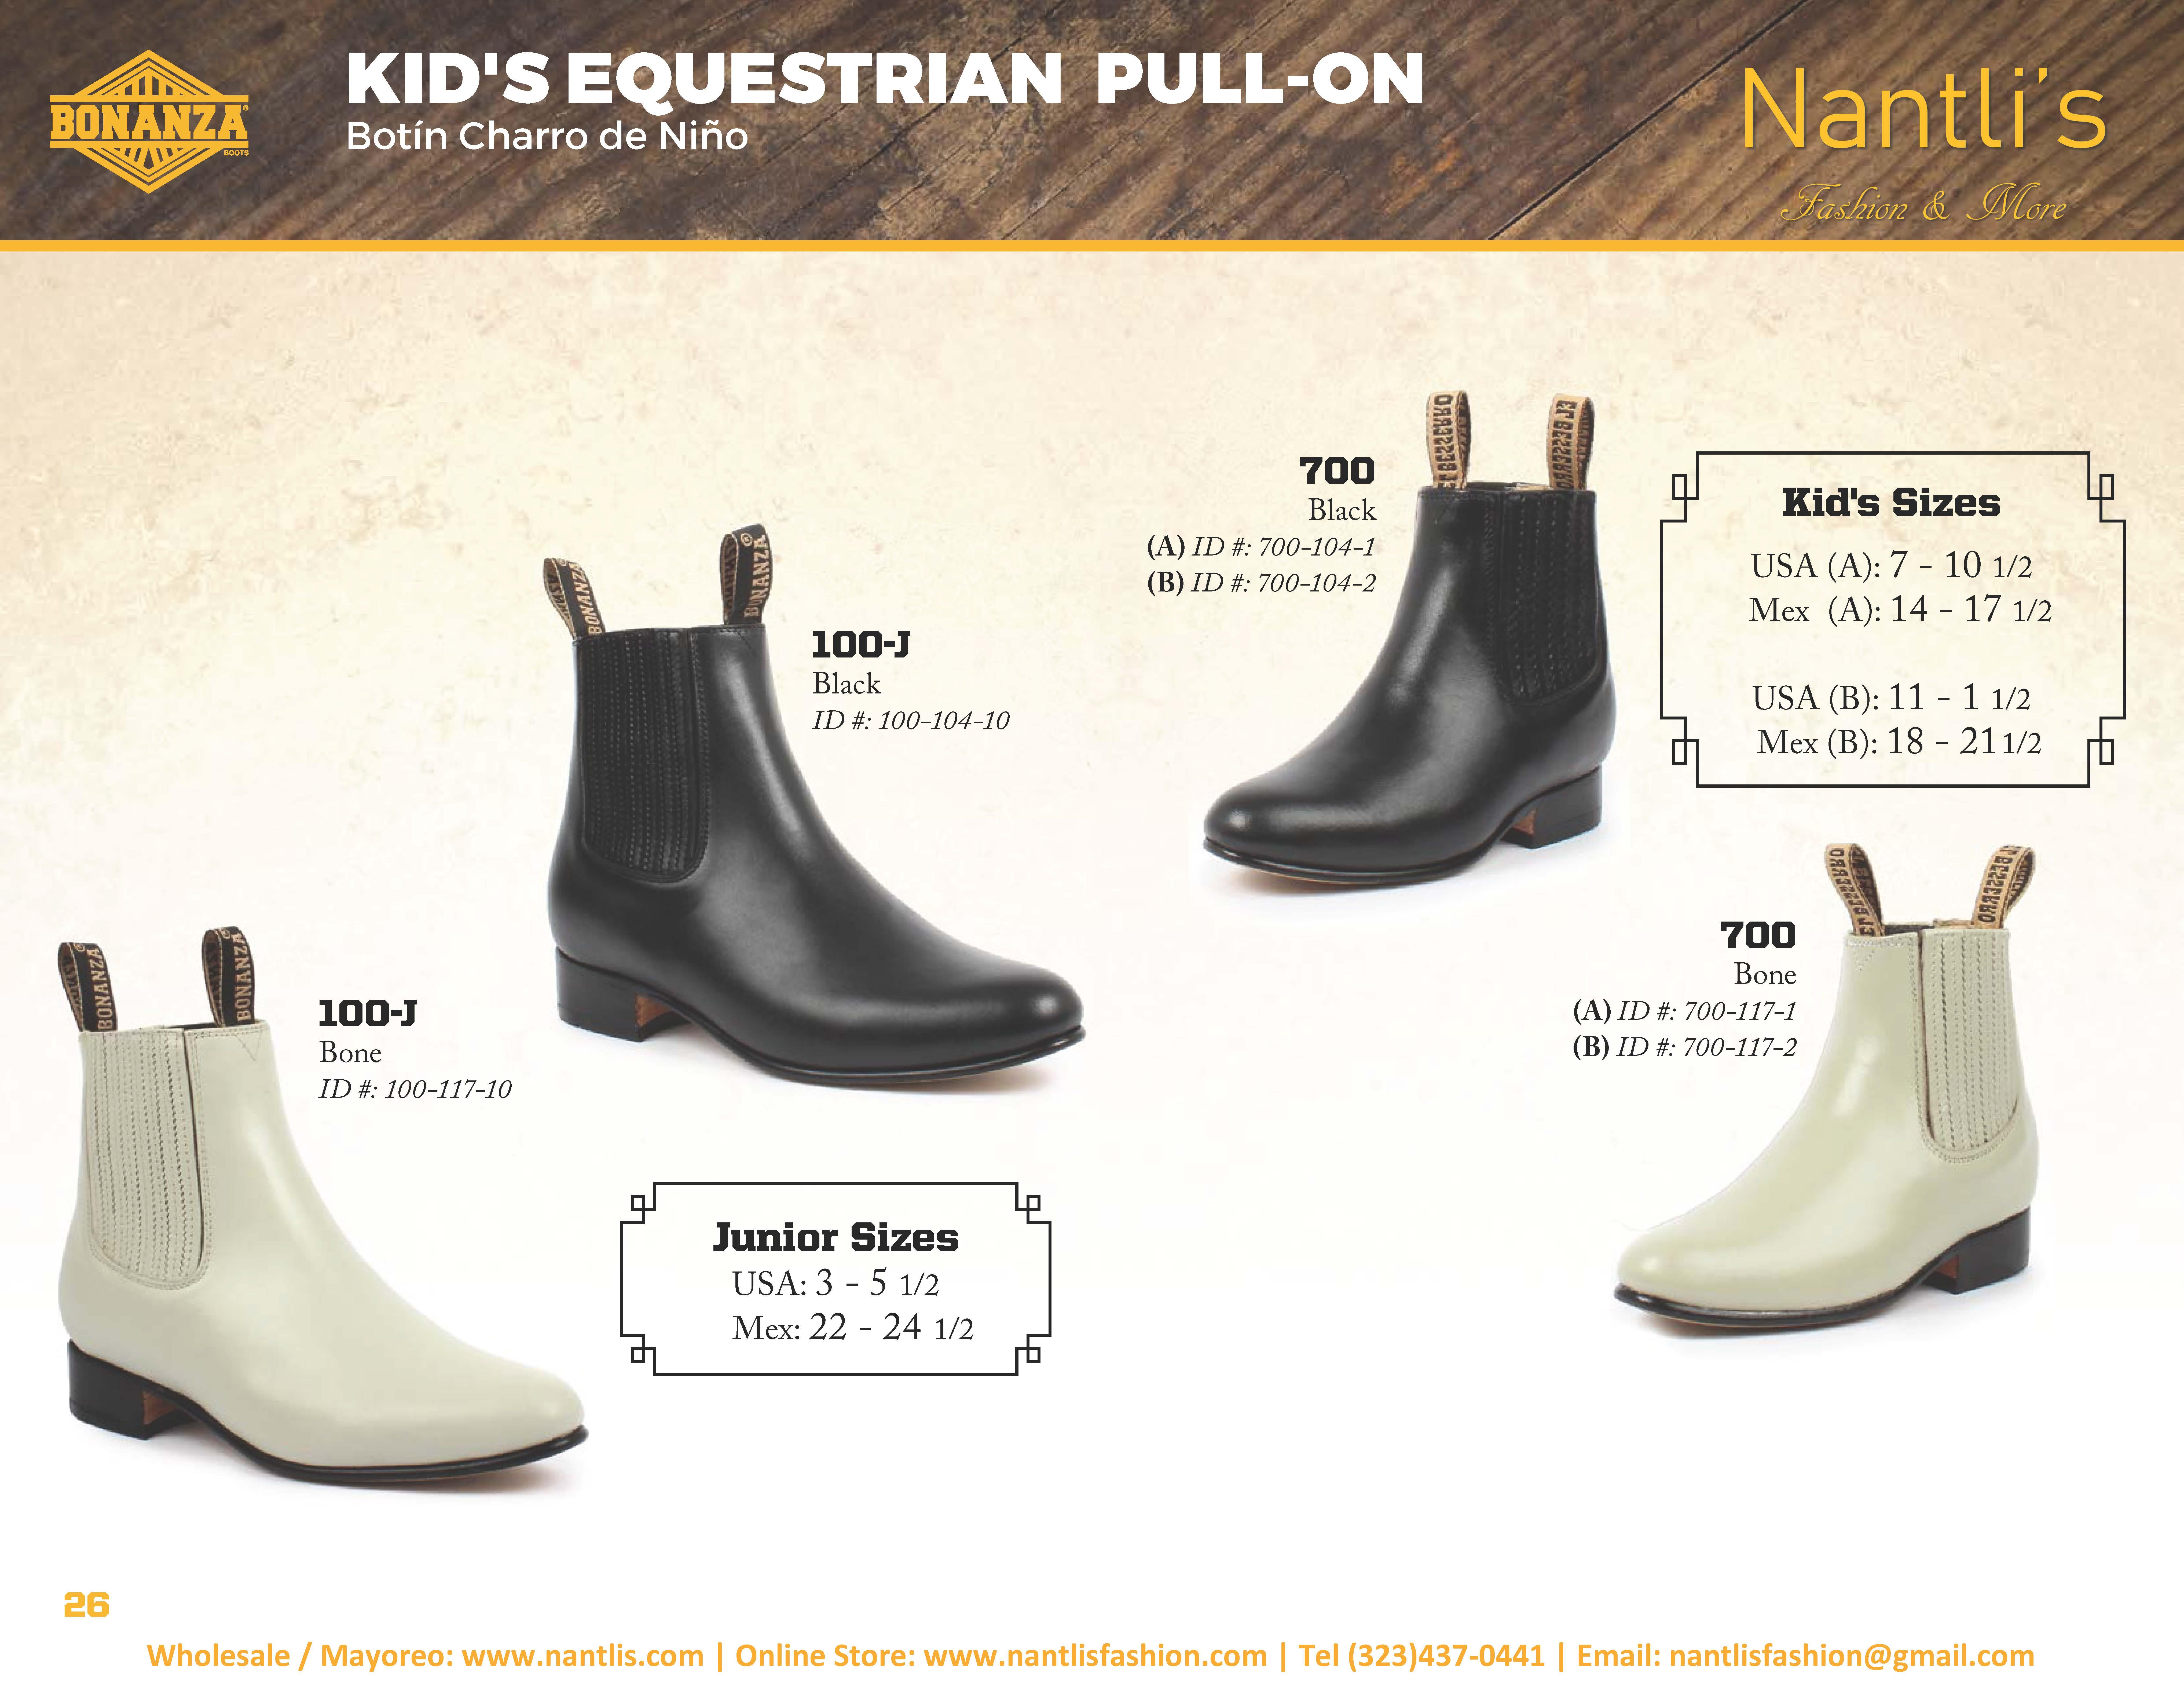 50a2b7d54b Nantlis-Bonanza vol 4 catalog botas vaqueras mayoreo Wholesale western  boots Page 26